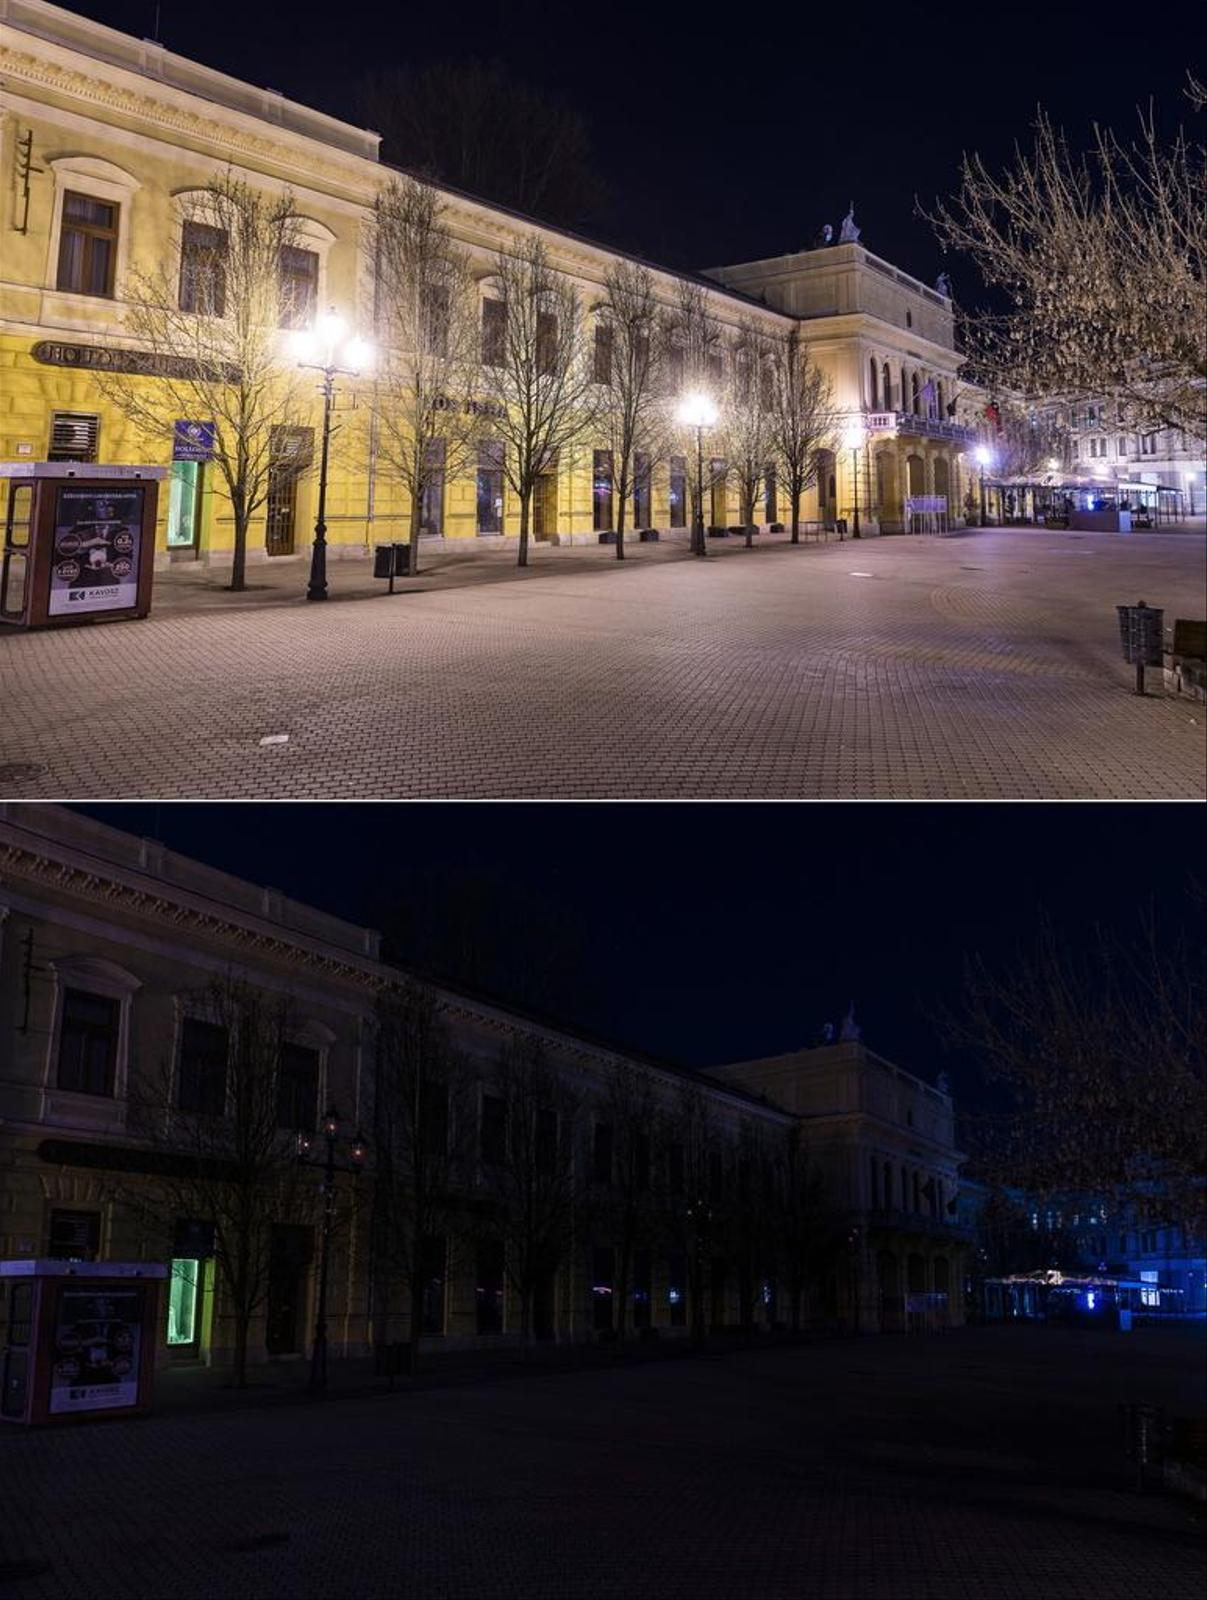 Flood light takes a one-time break in Nyiregyhaza, Hungary.